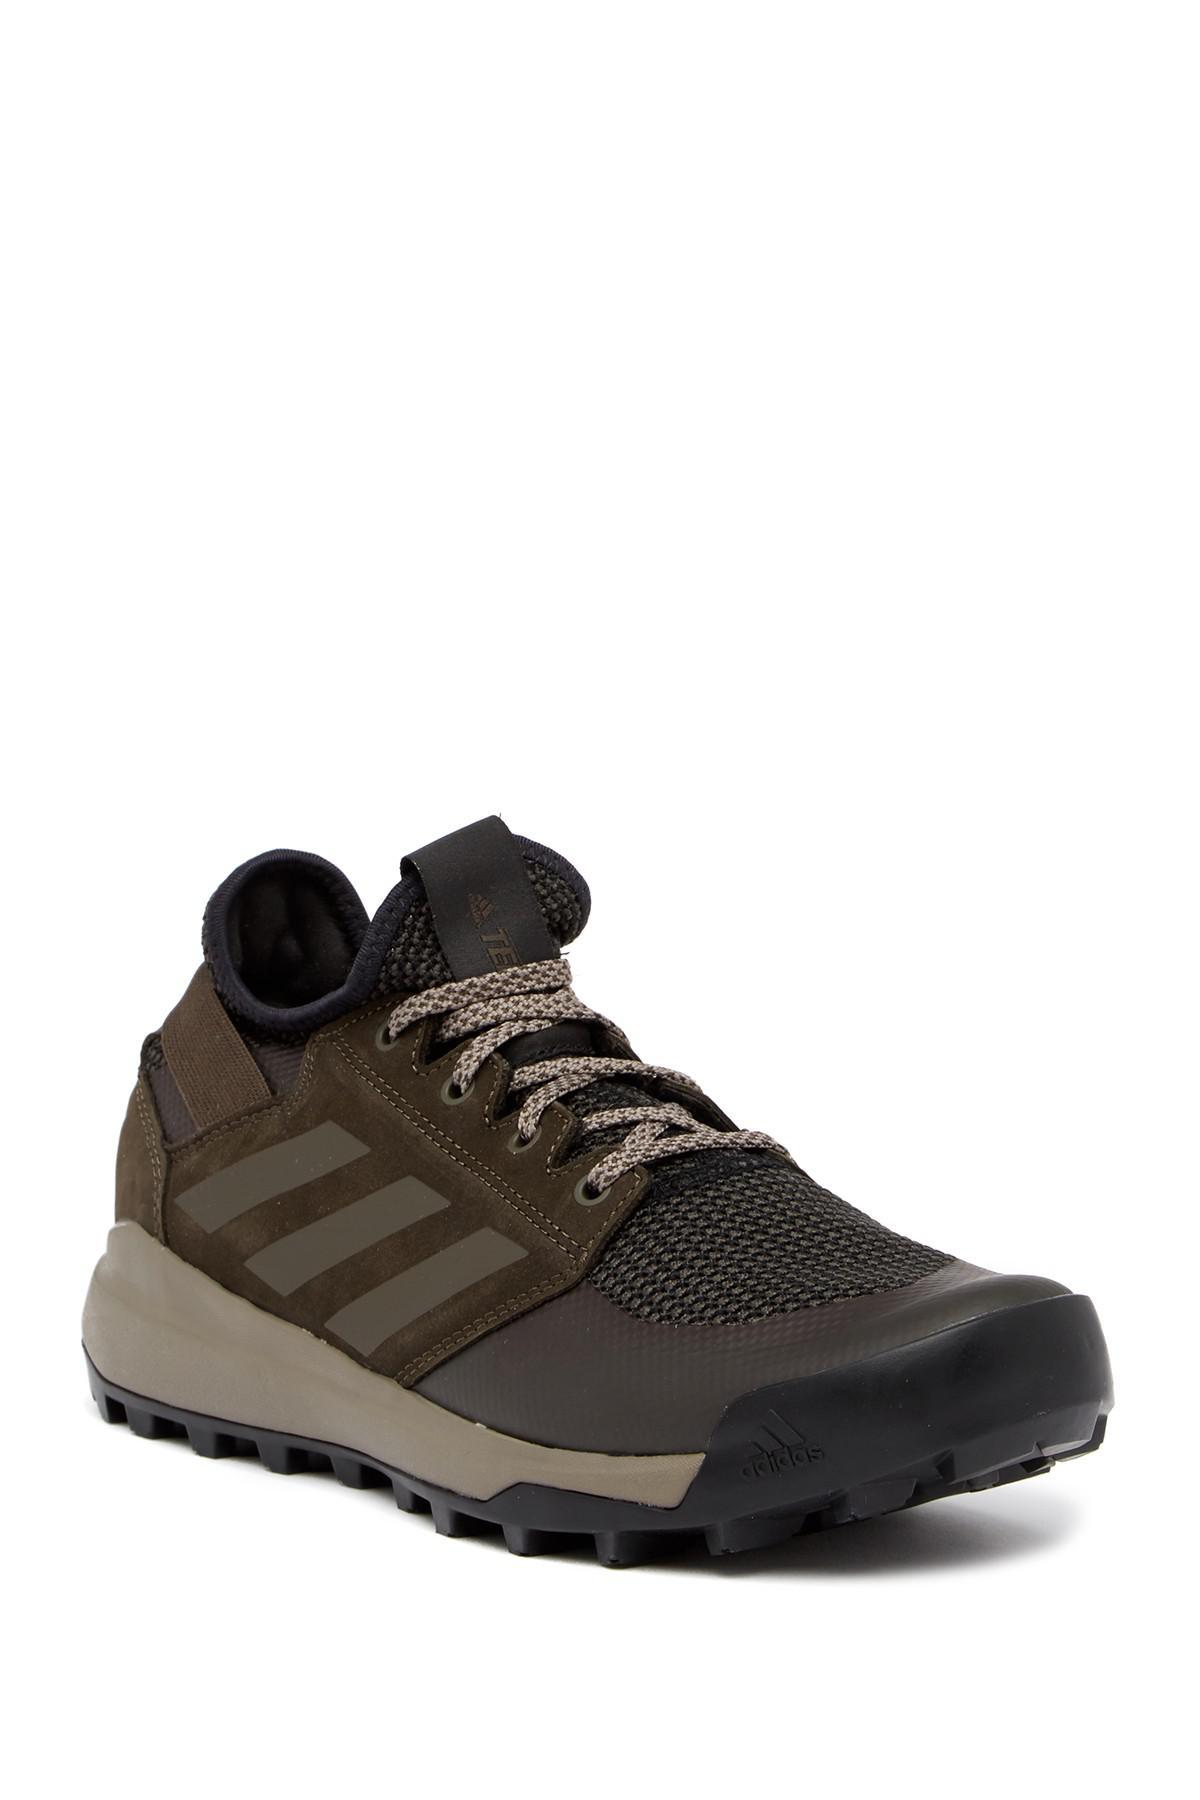 Nubuck Adidas Sneaker Pitch Mountain Terrex Yfm6Ib7yvg